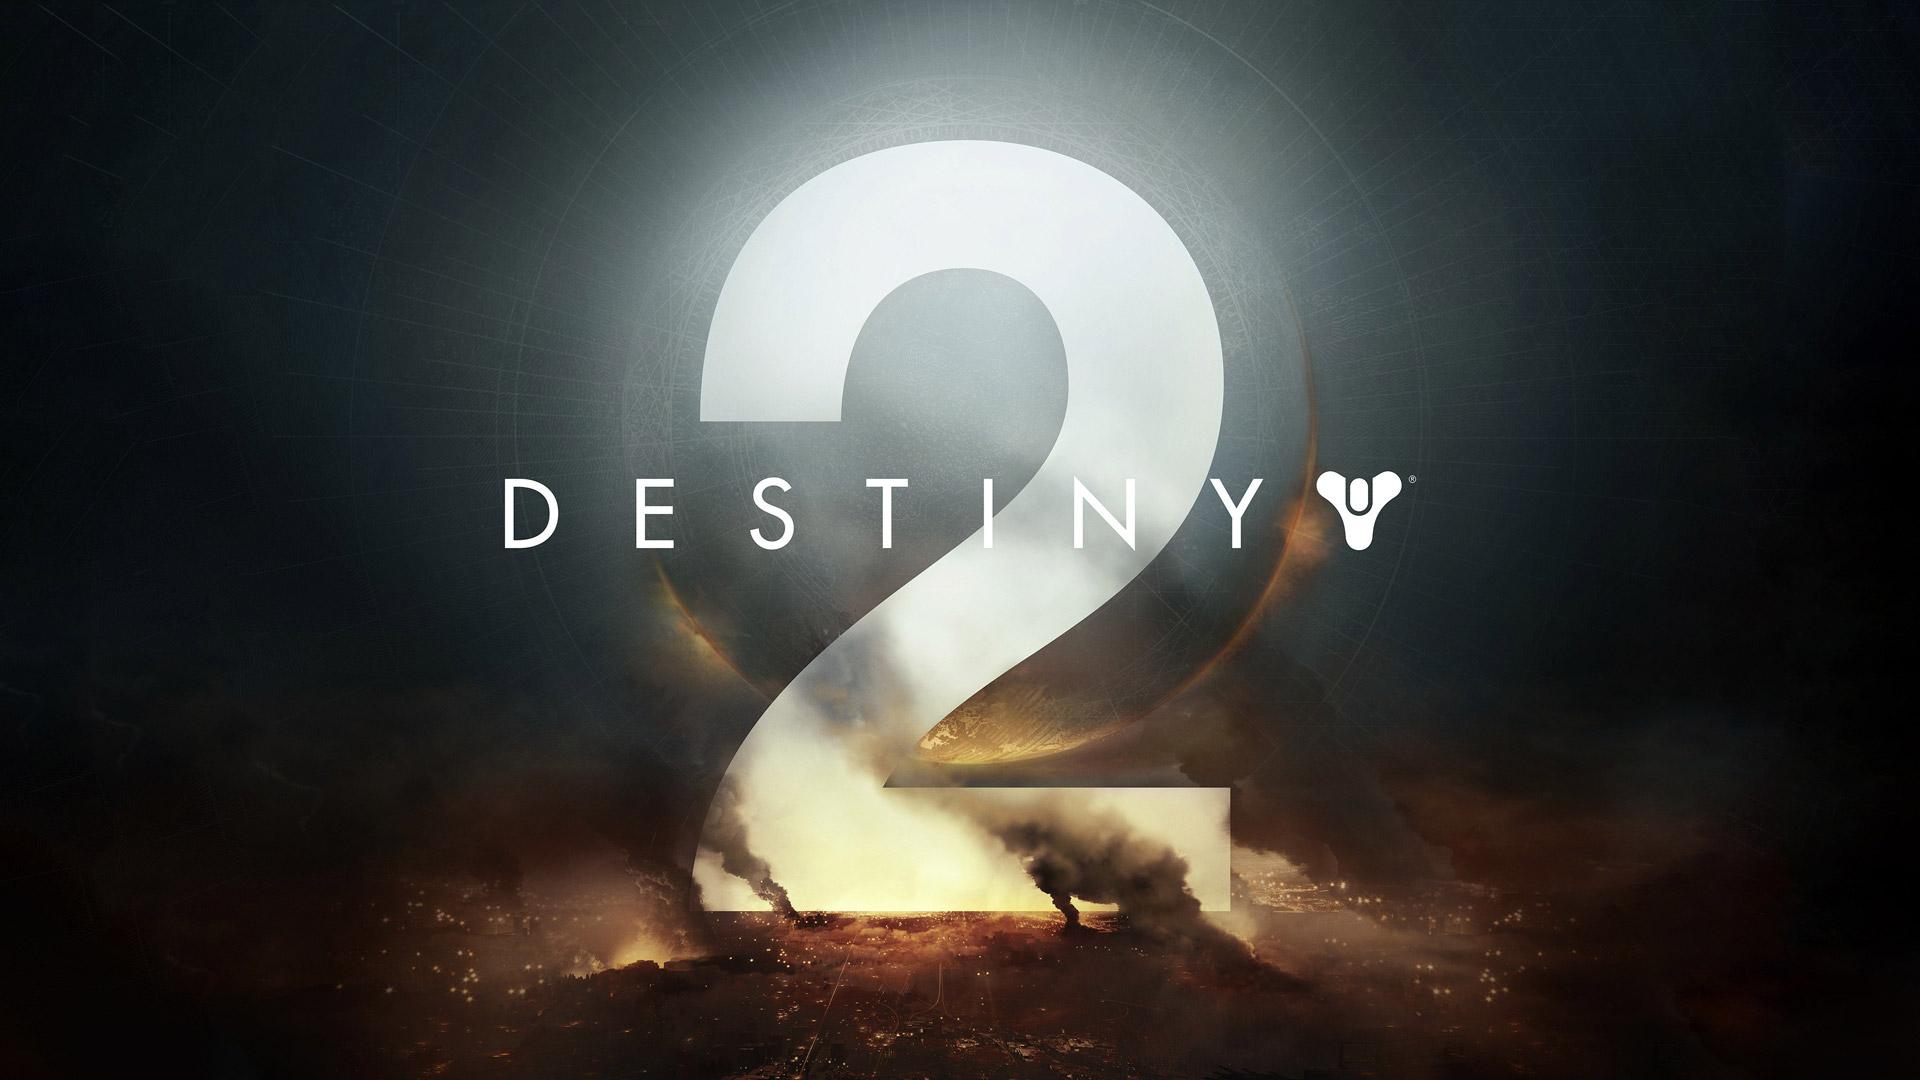 Destiny 2 Wallpaper in 1920x1080